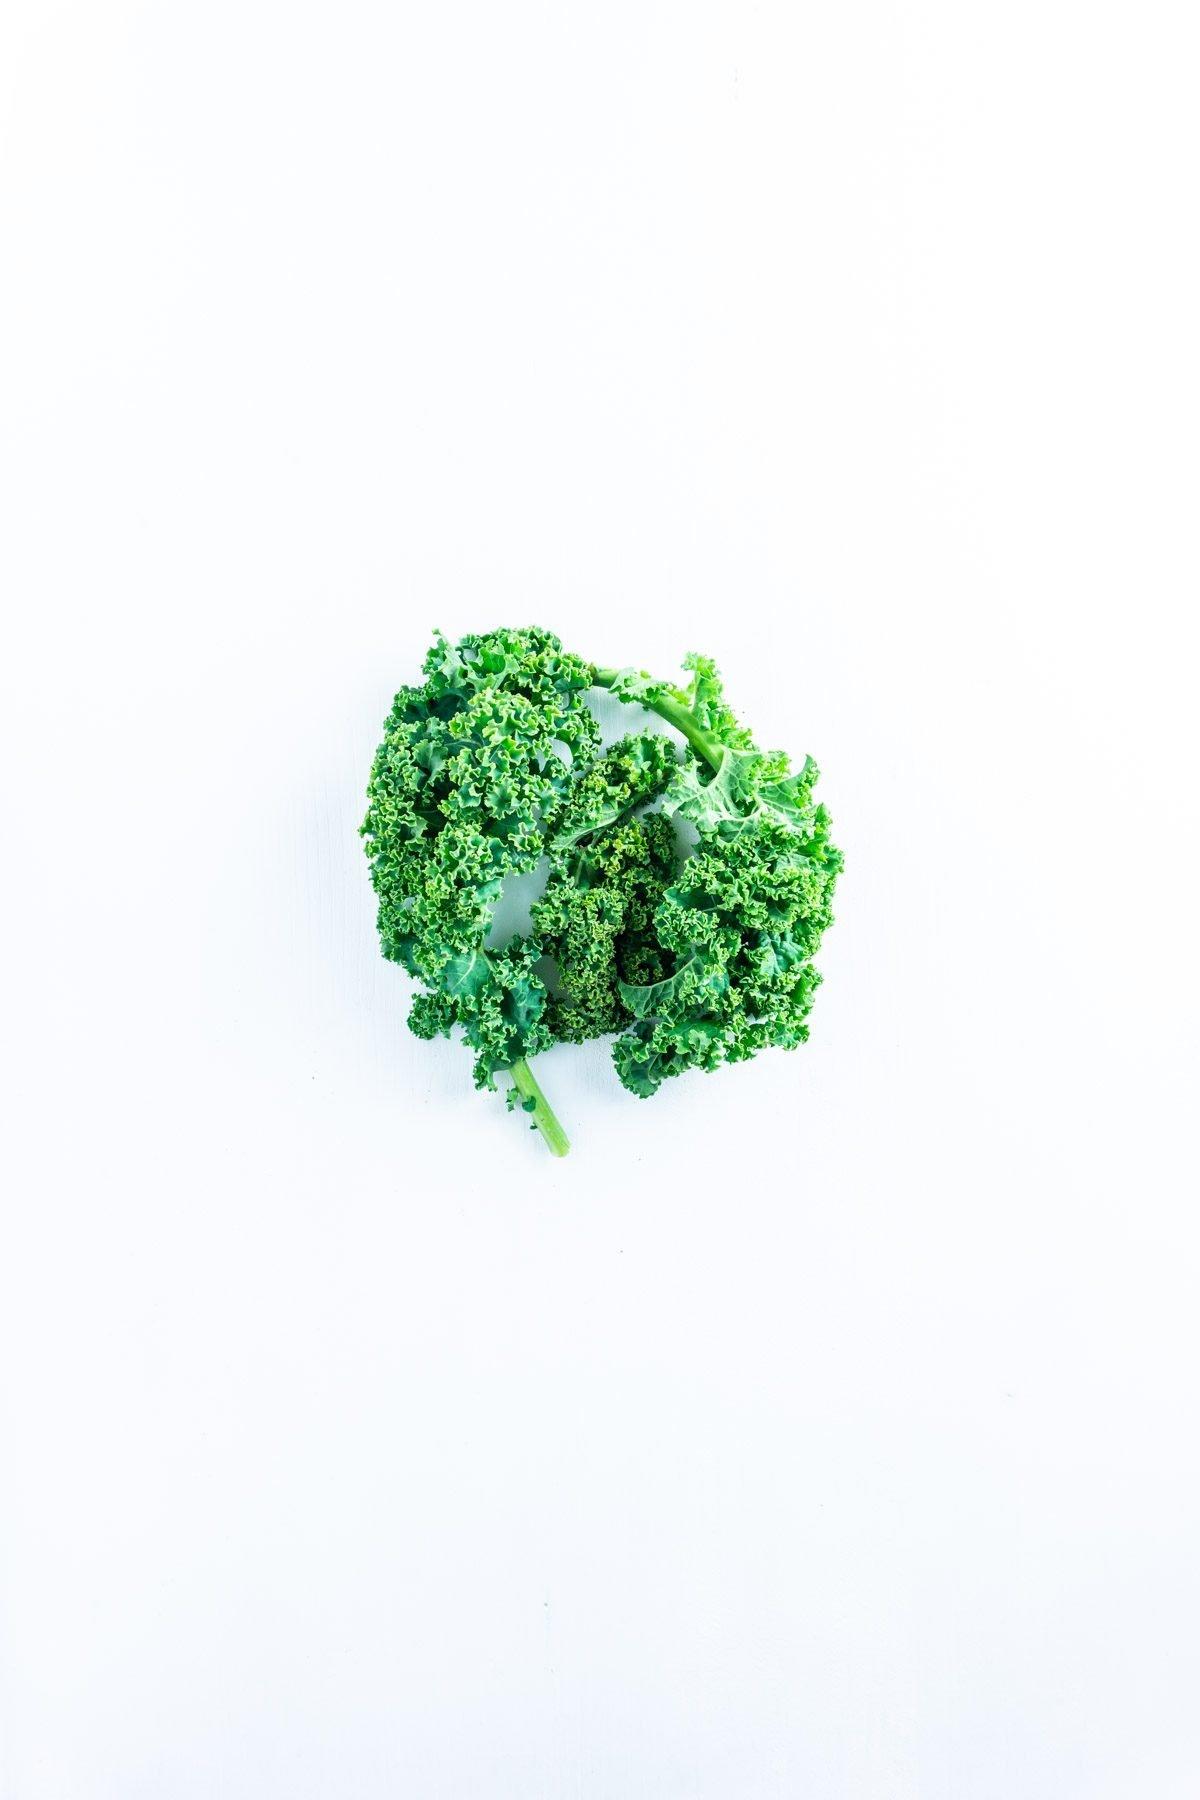 Kale on a white underground